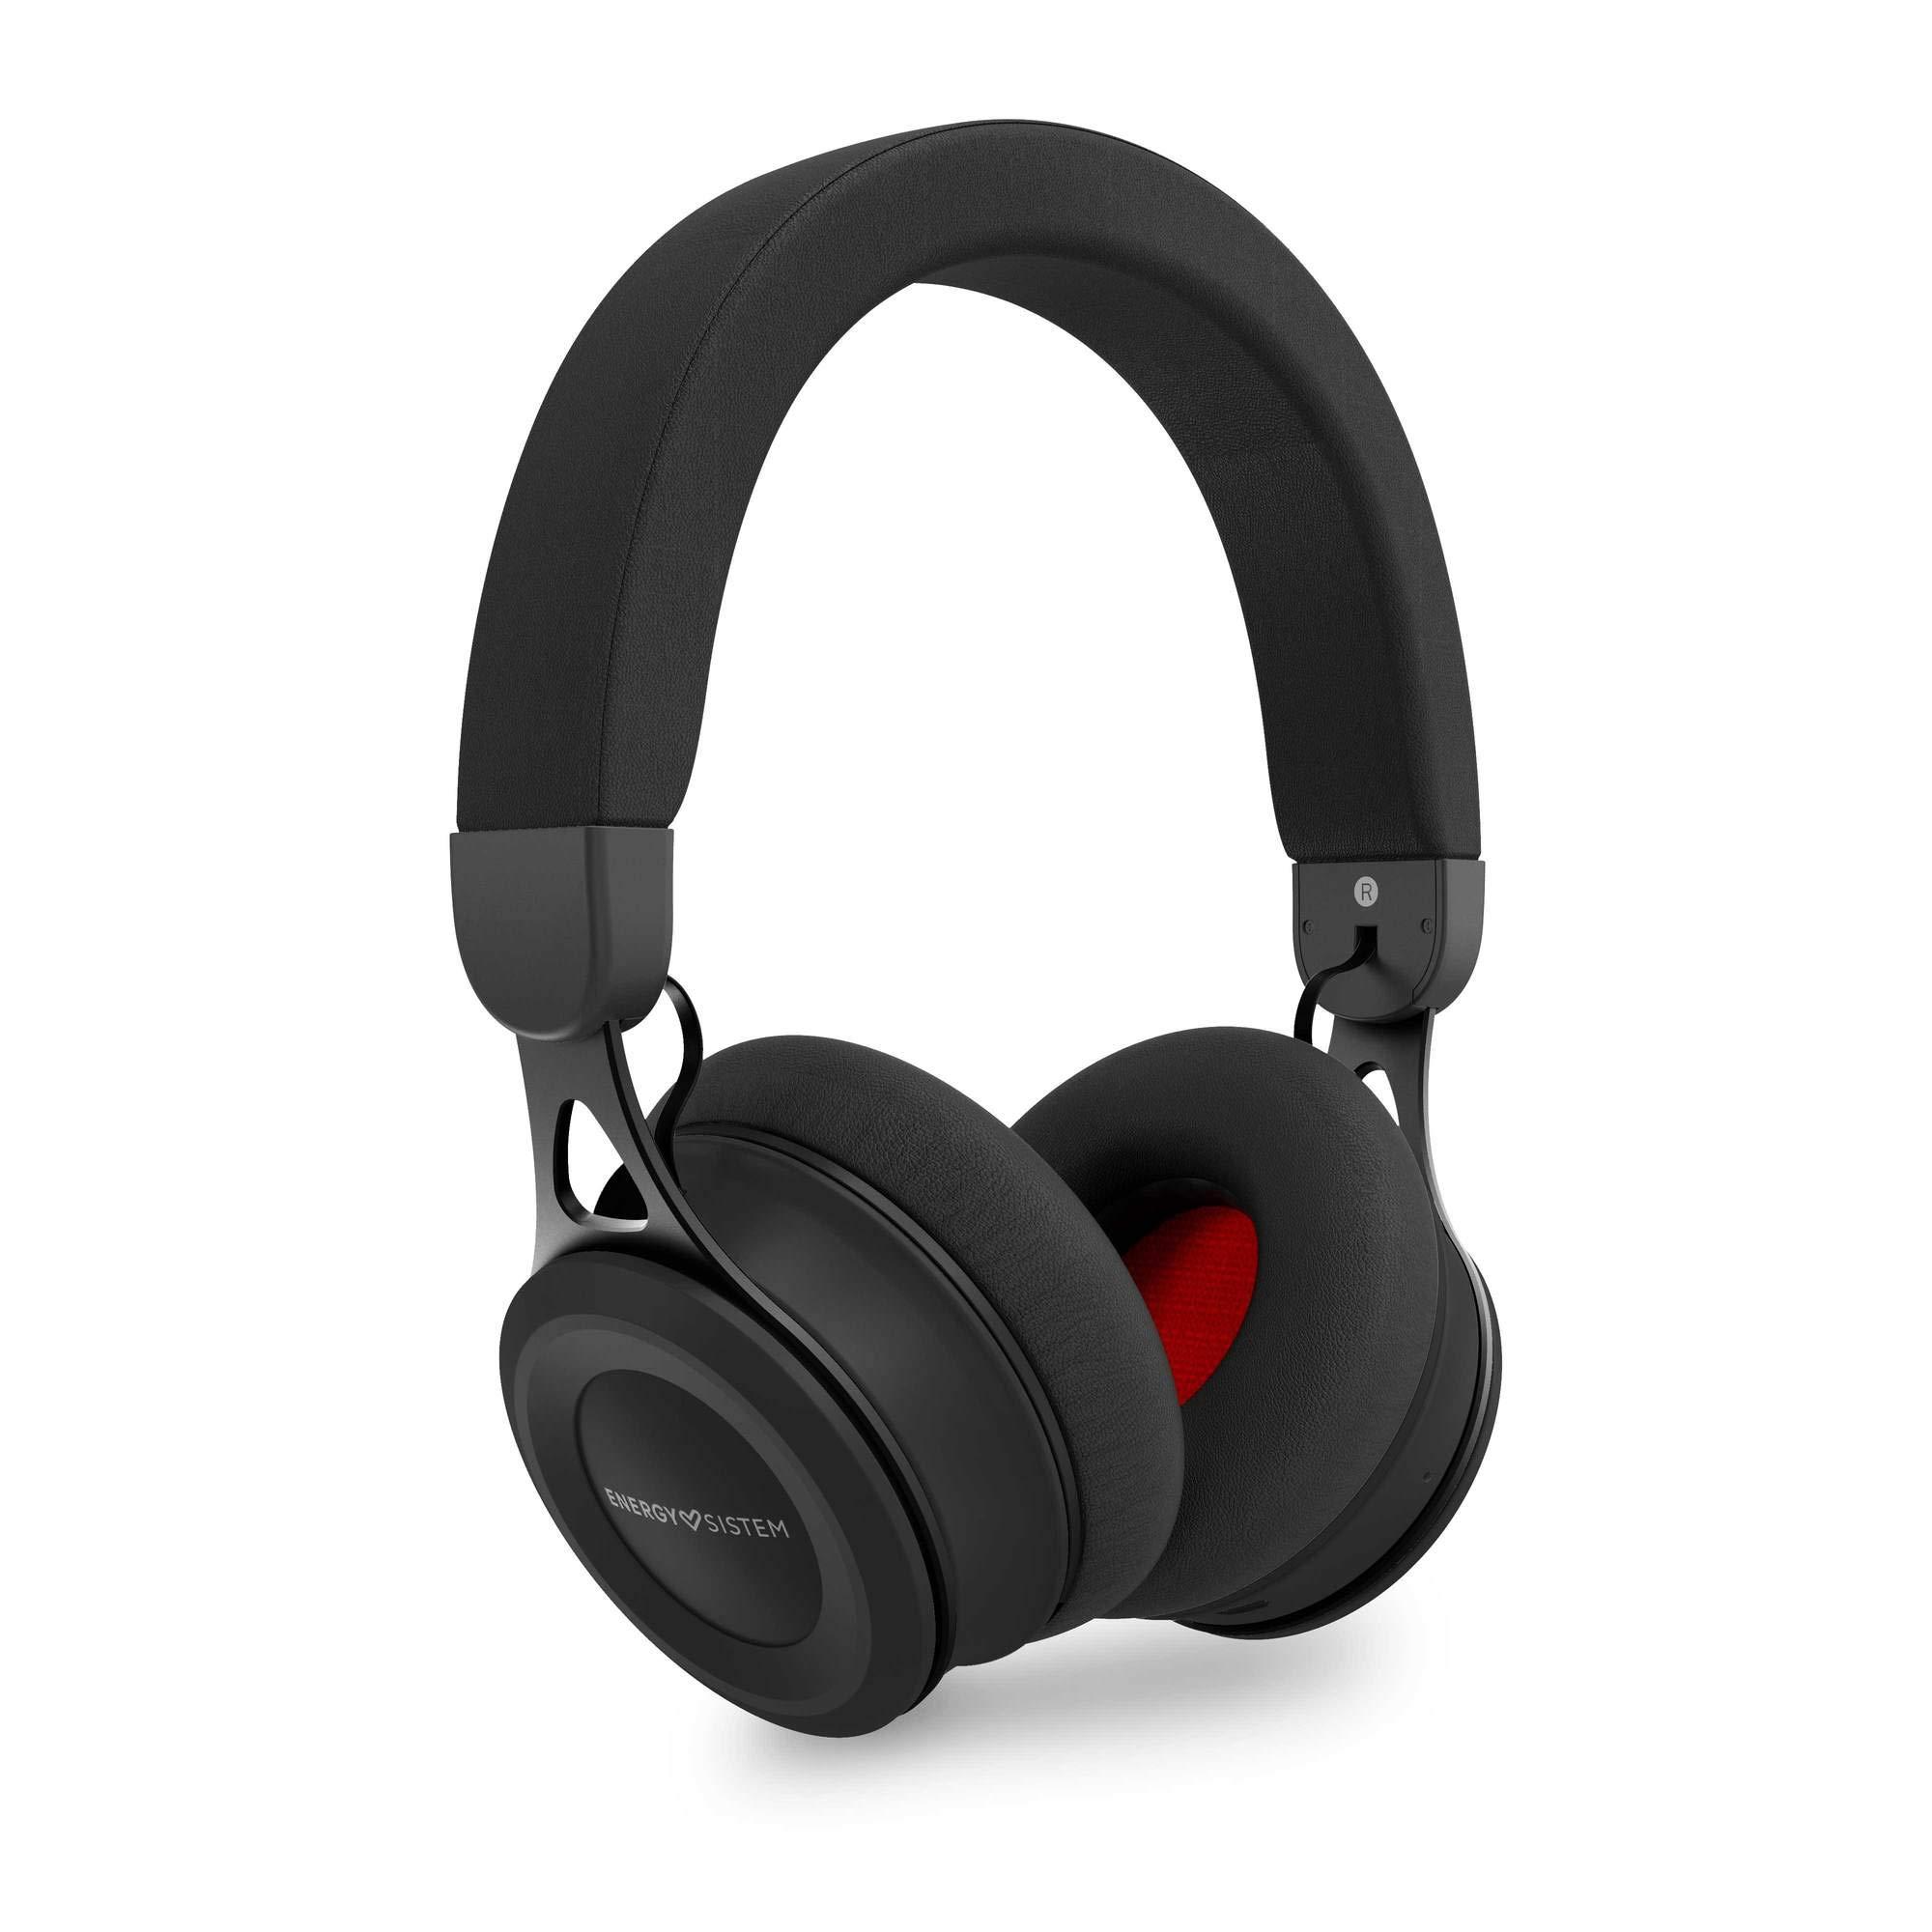 Energy Sistem BT Urban 3 - Auriculares Bluetooth (Deep Bass, Acabados metálicos, batería de Larga duración), Color Negro: Energy-Sistem: Amazon.es: Electrónica